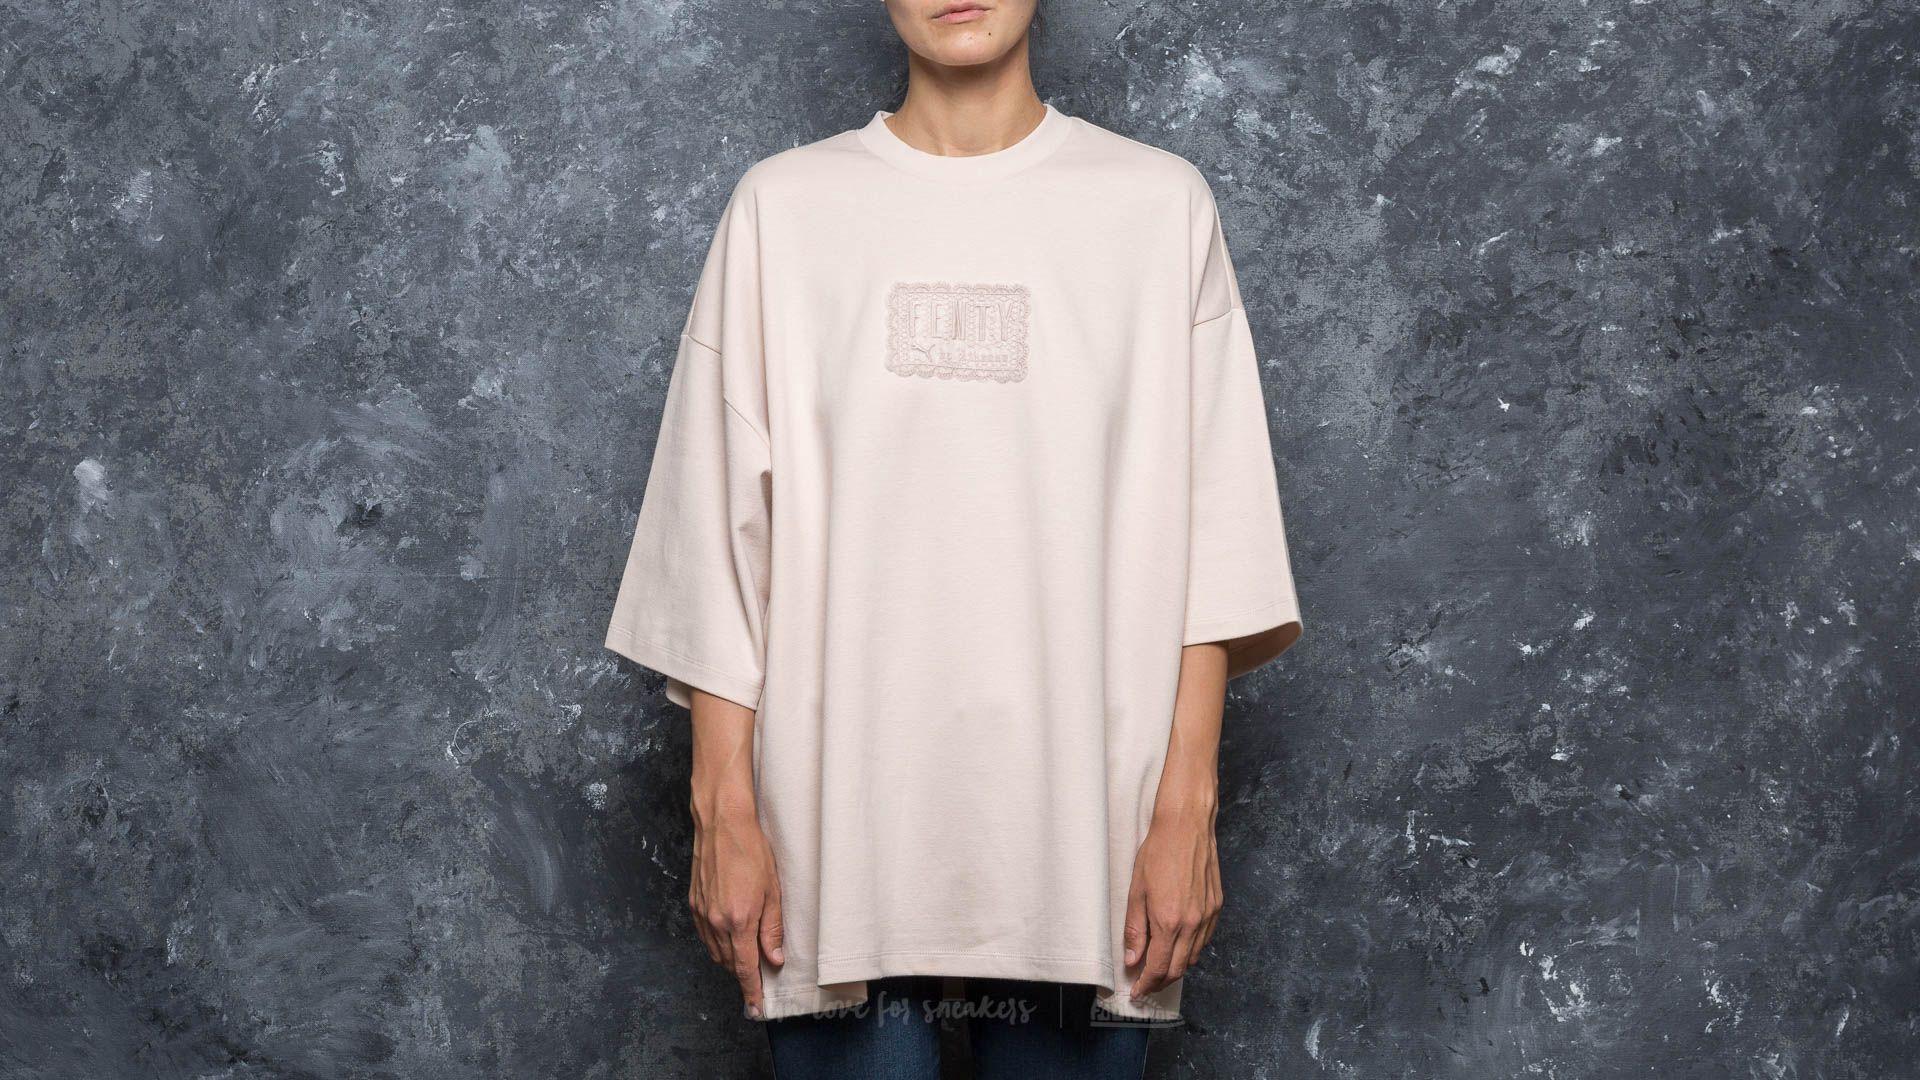 Puma Fenty x Rihanna Oversized Crew Neck T-Shirt Pink Tint  0c925e9e3